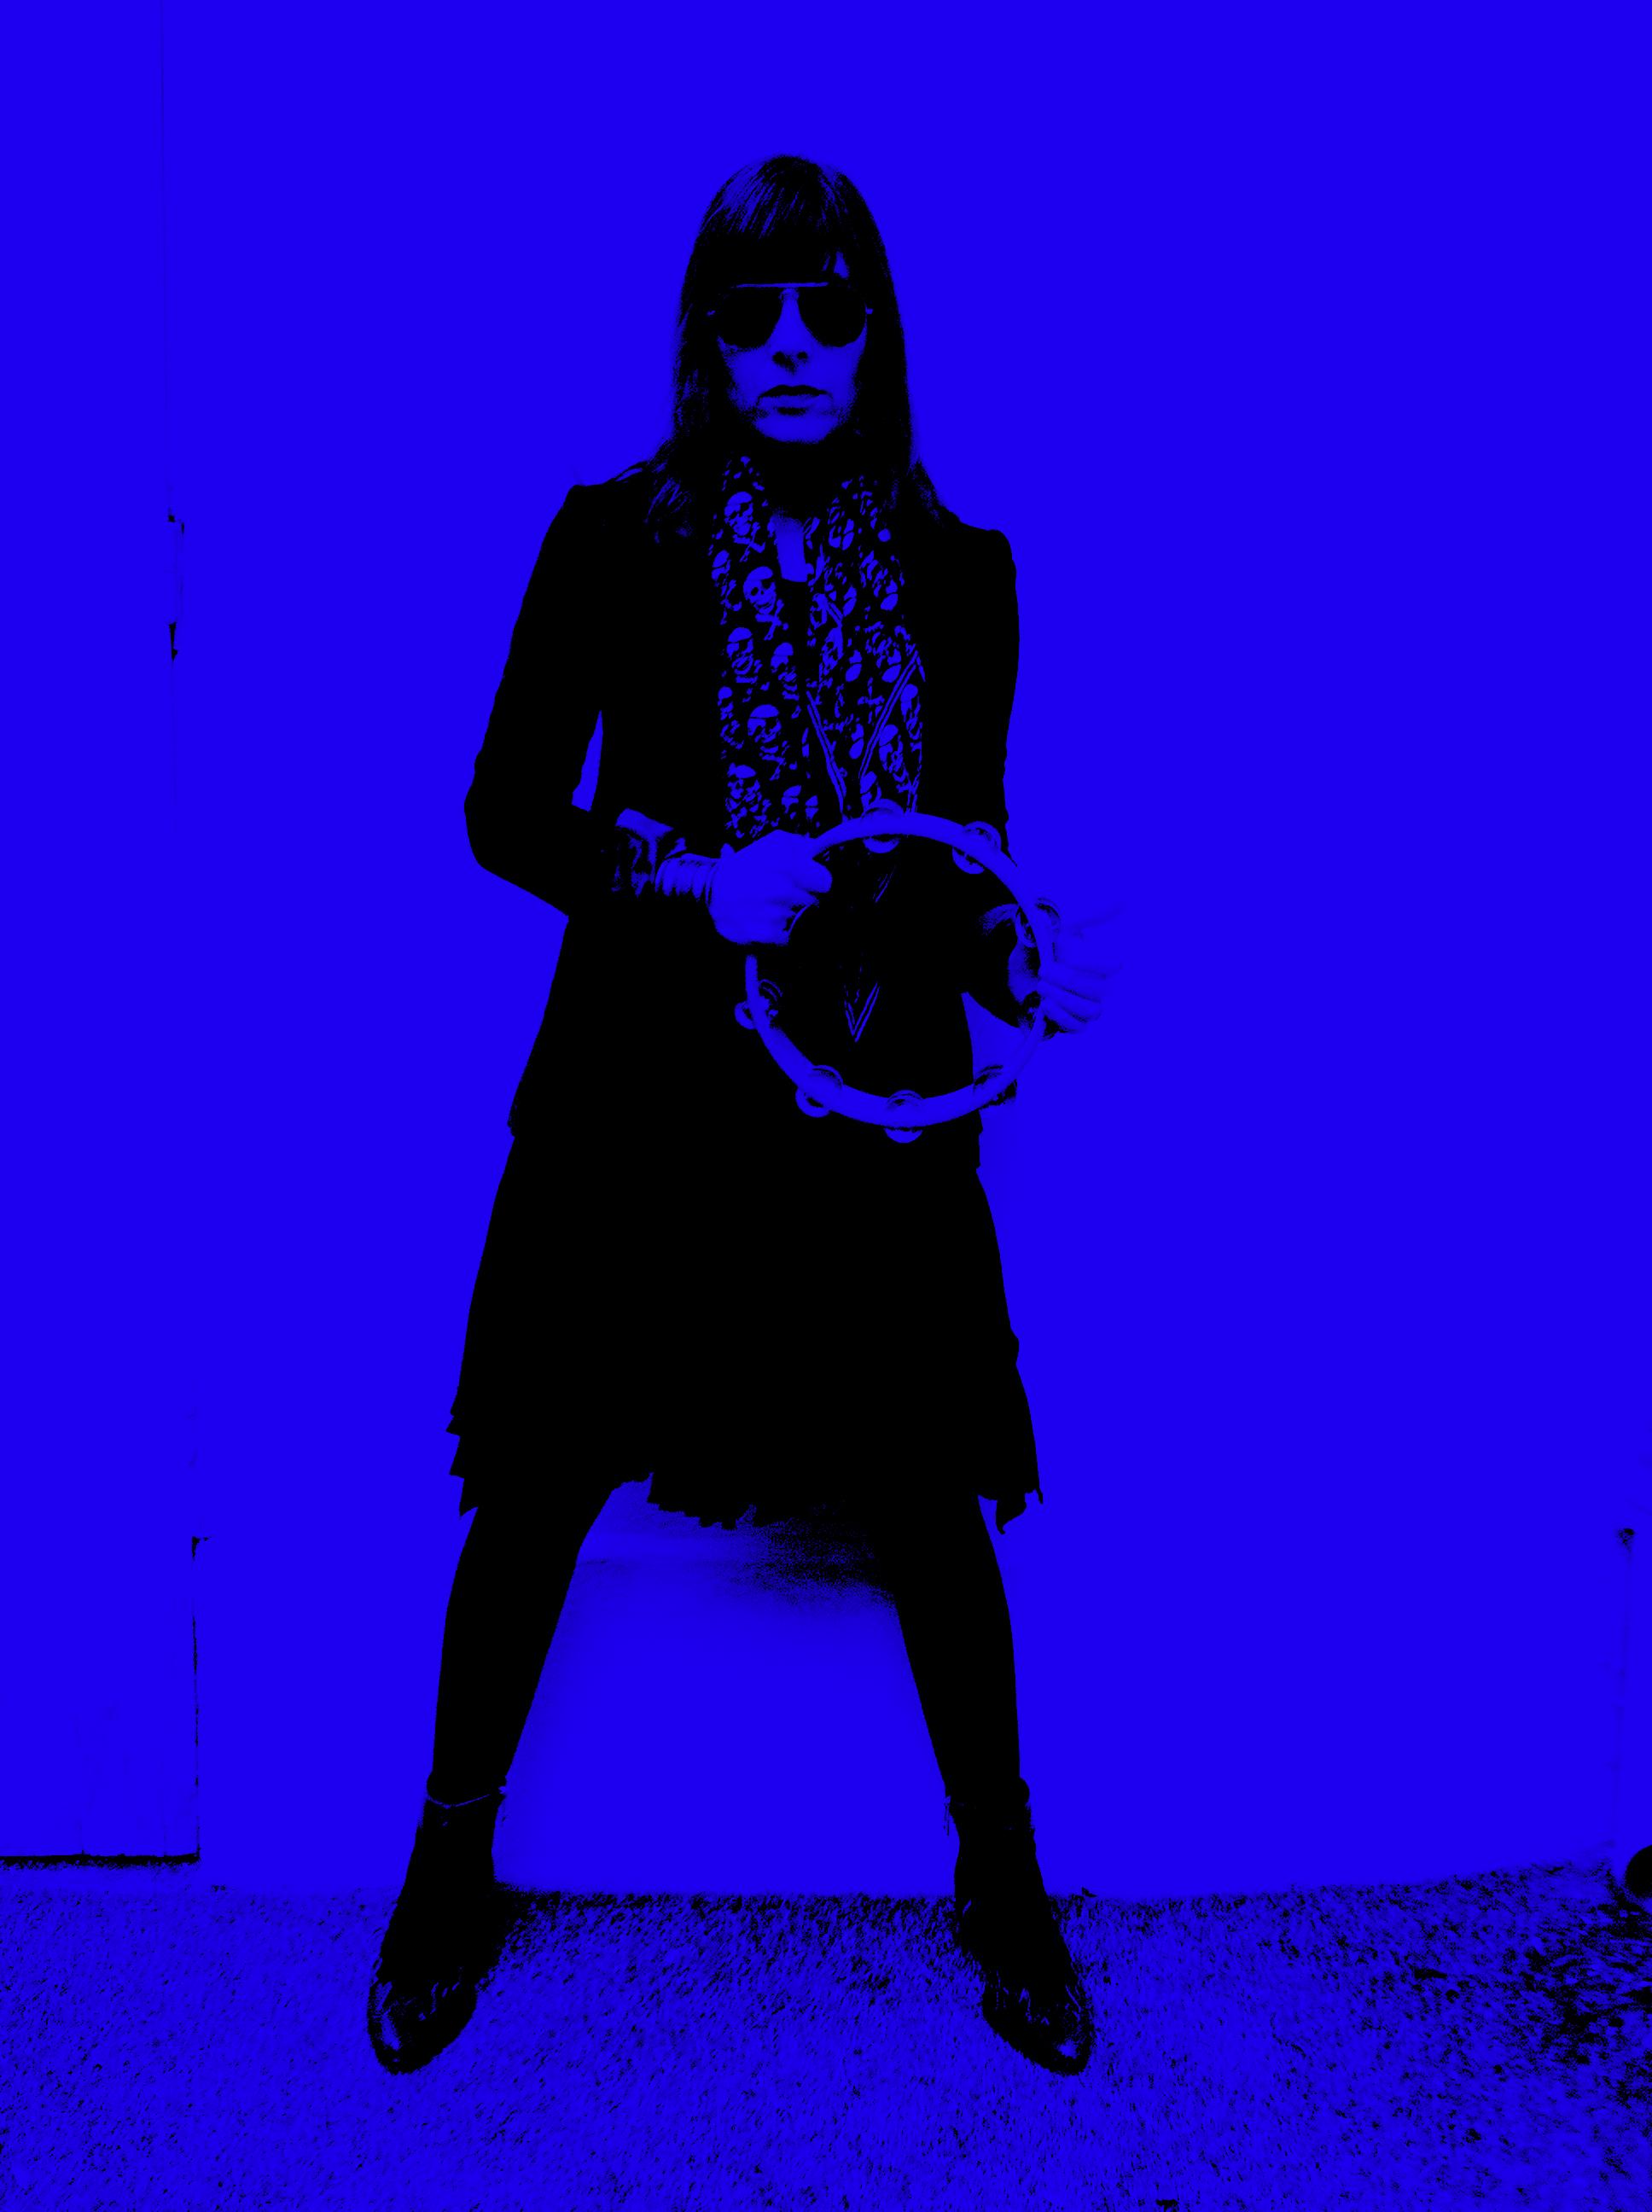 Angela_Rock_Paris_Blue-1464645446.jpg